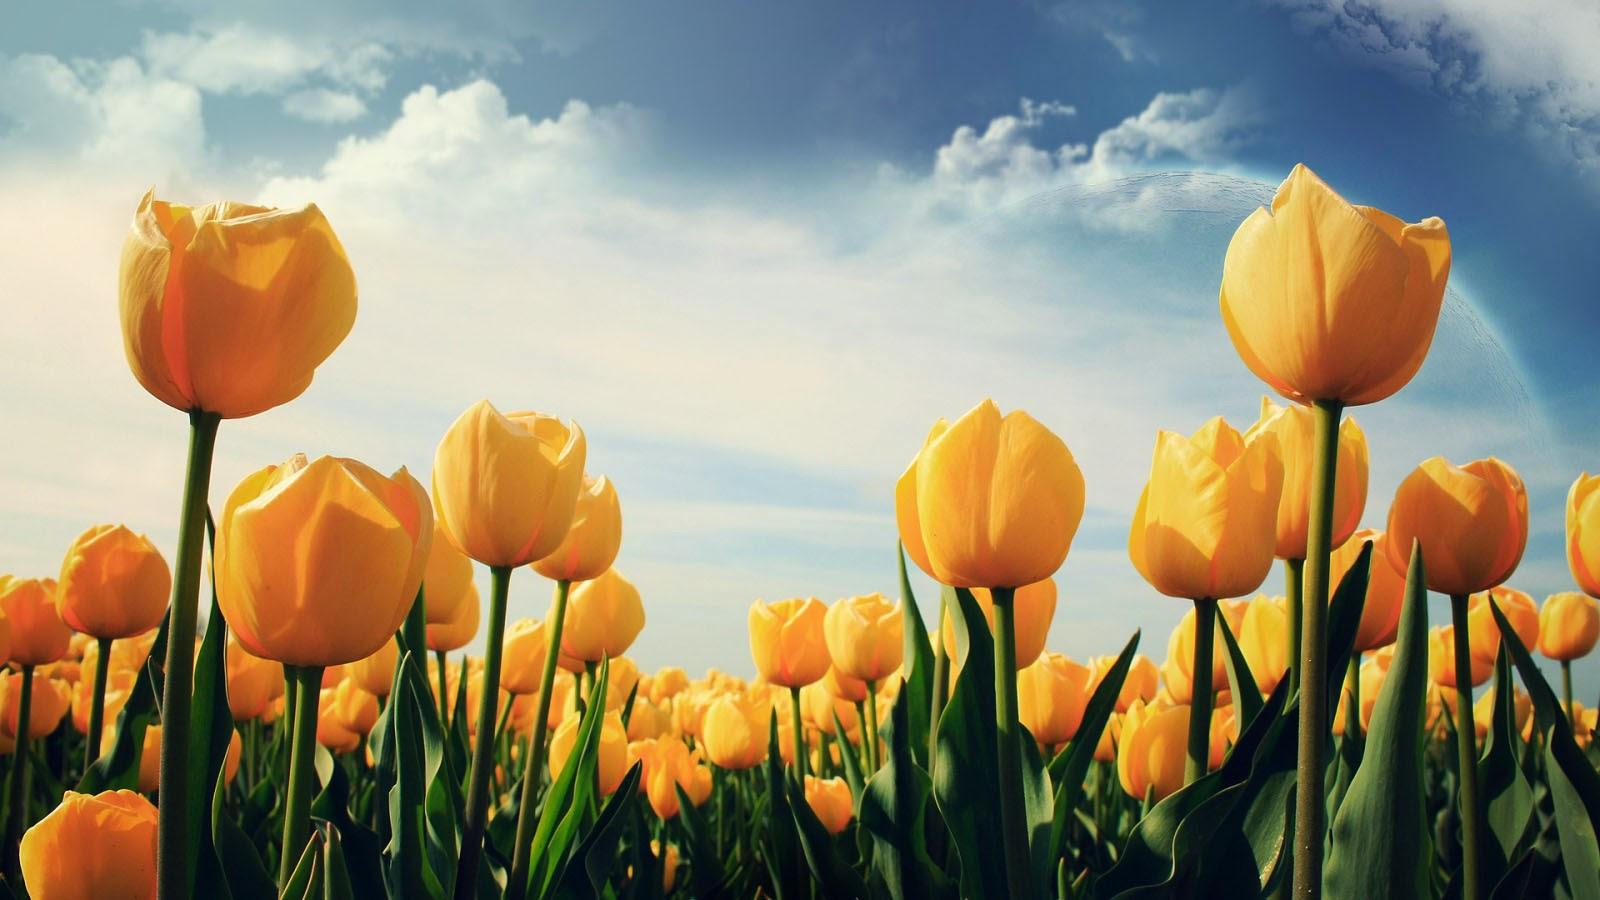 40 beautiful flowers desktop wallpapers - 1 ~ amazing world gallery